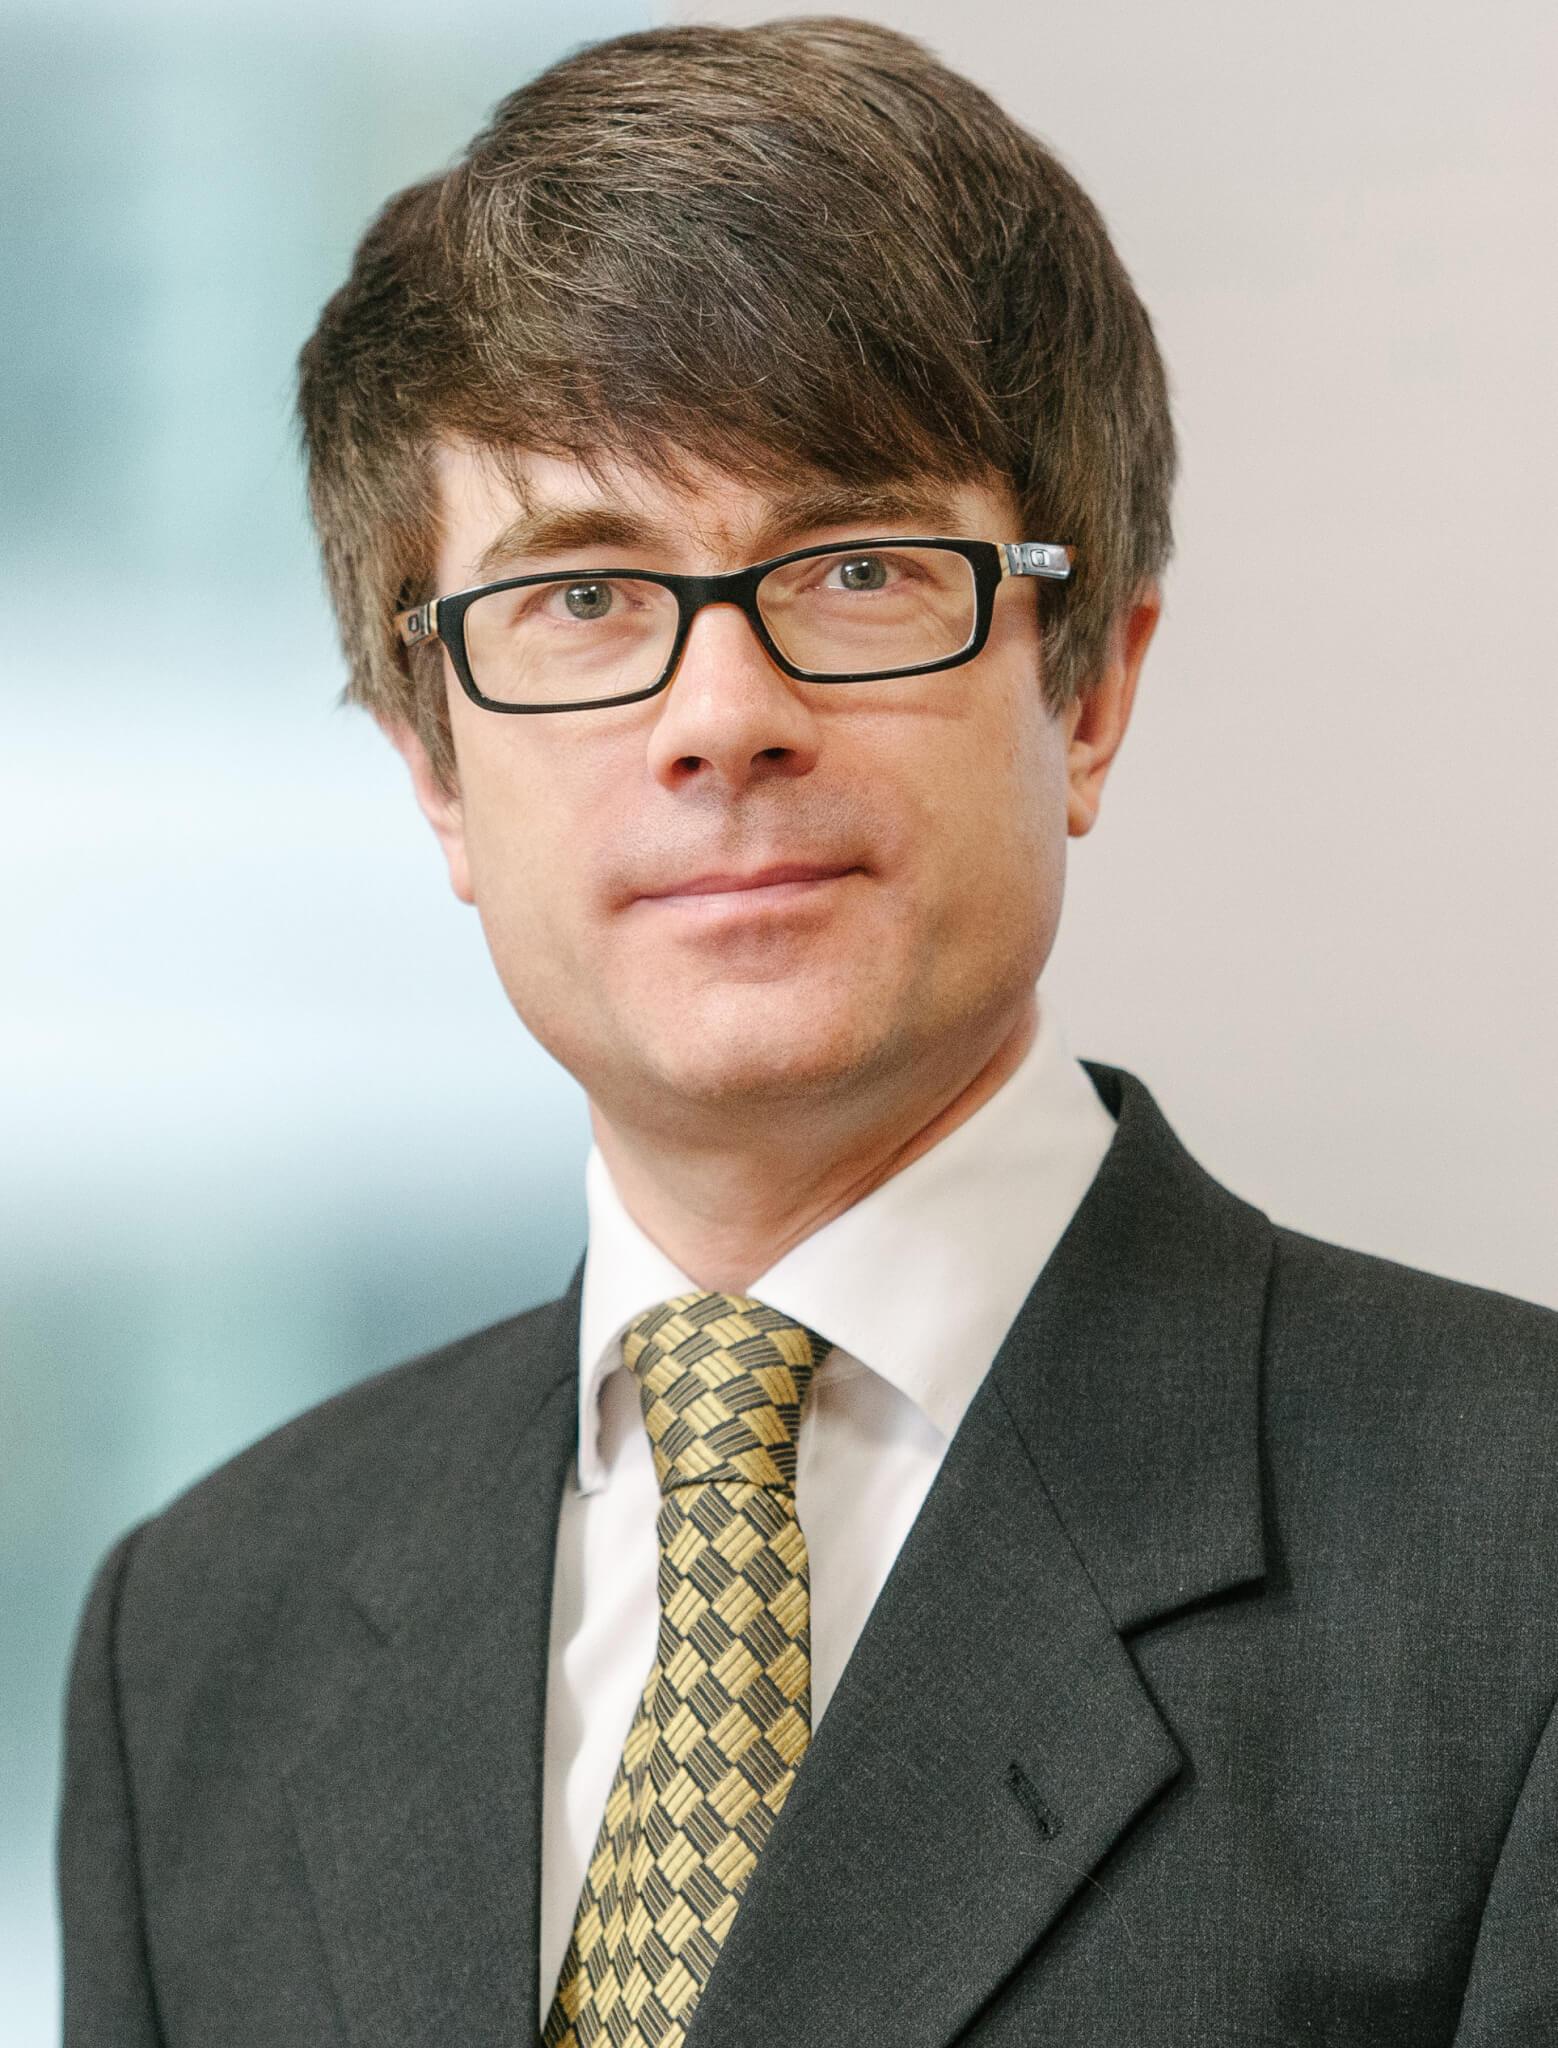 Gareth Popkins